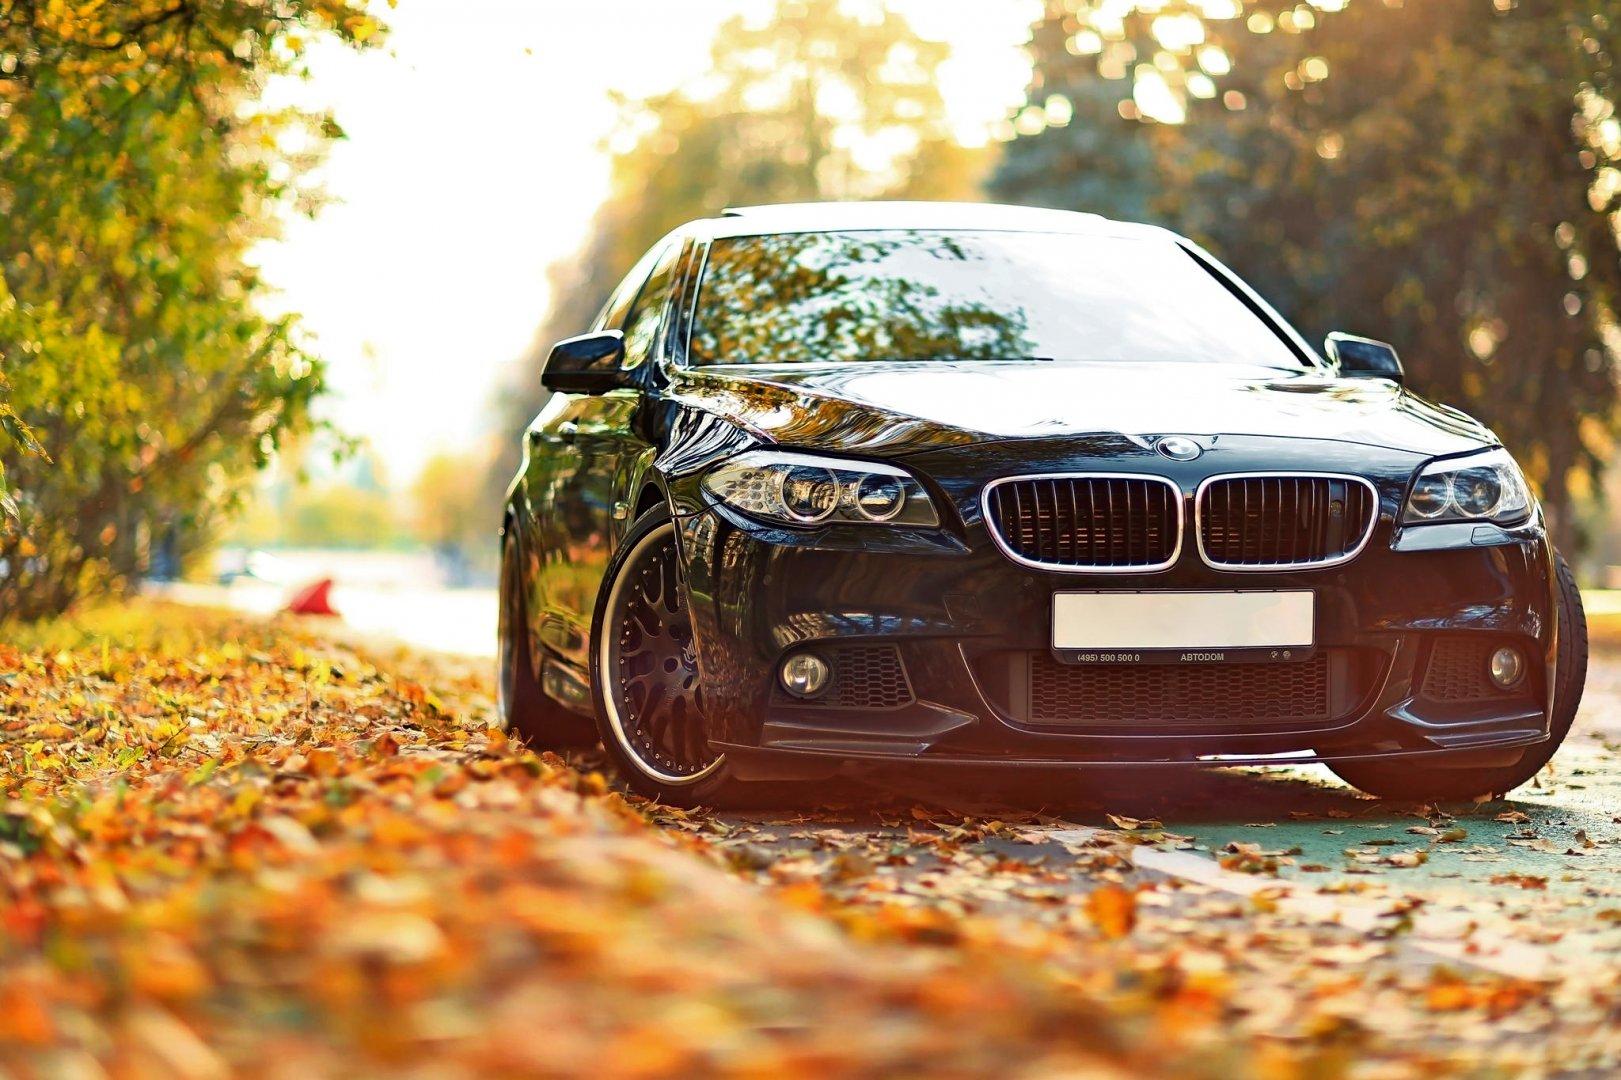 BMW-Car-HD-Wallpaper.jpg - البوم مازاكوني - Mazakony ...